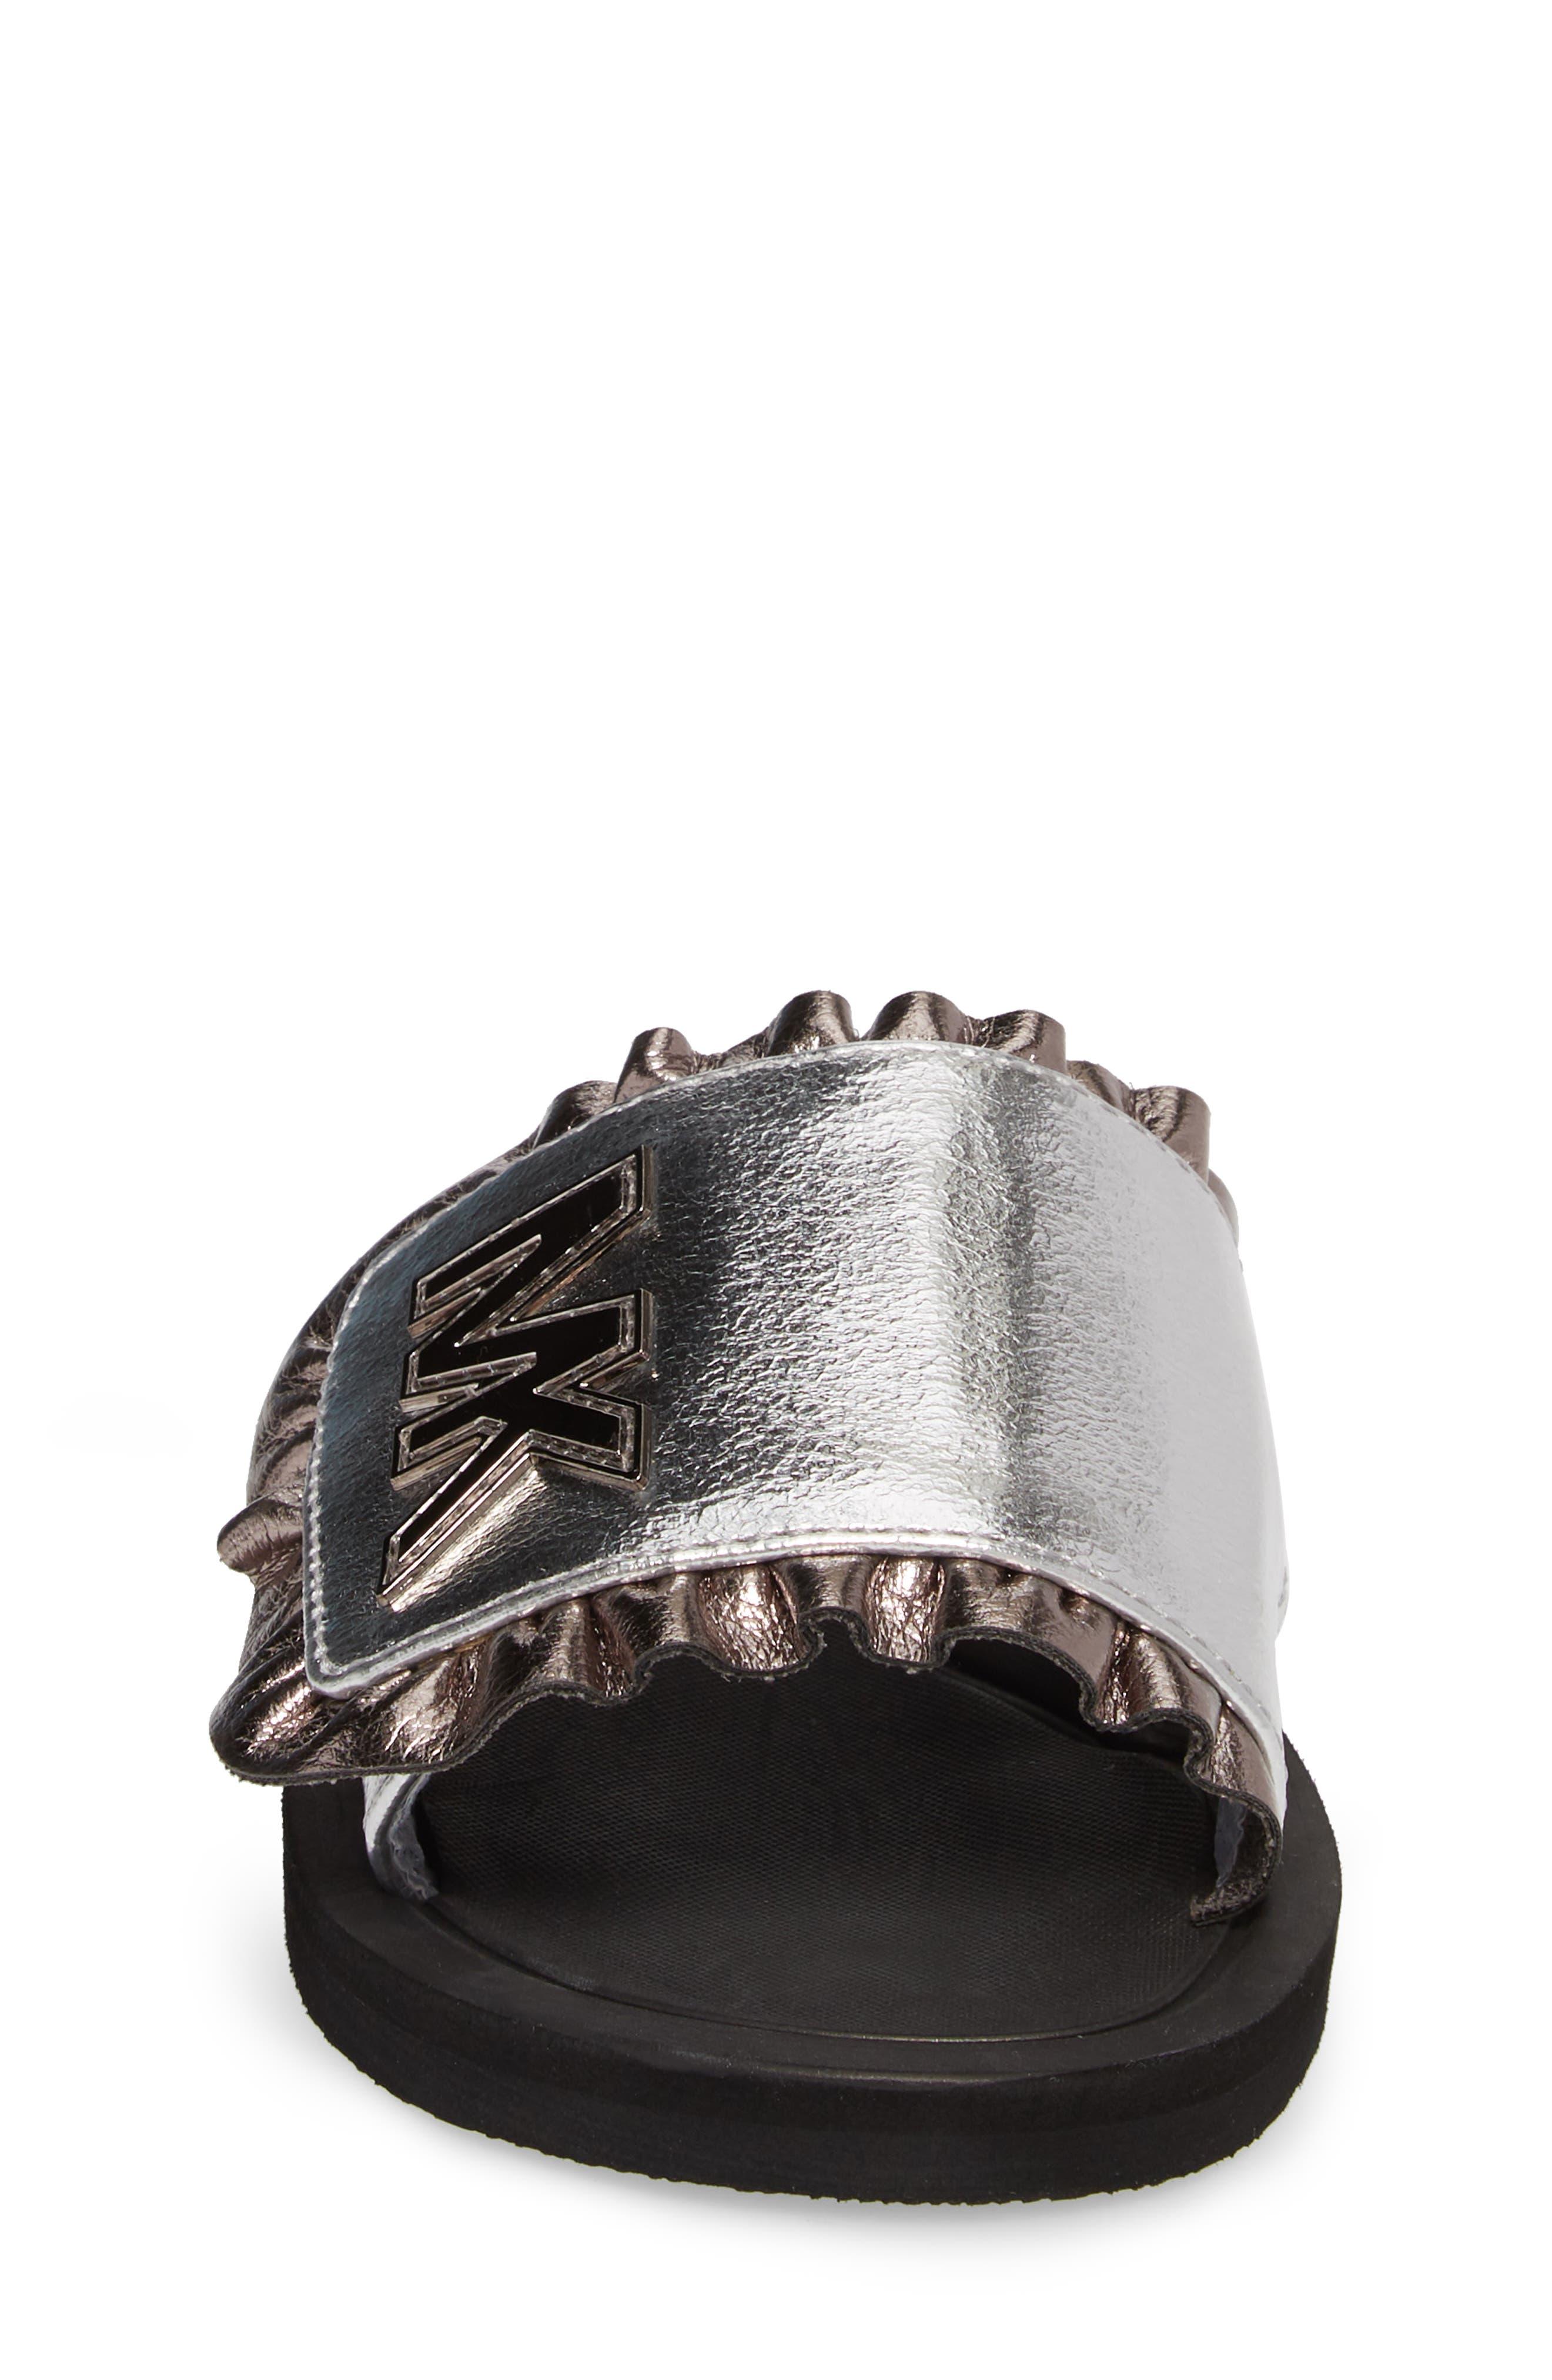 Eli Jack Metallic Slide Sandal,                             Alternate thumbnail 4, color,                             Silver